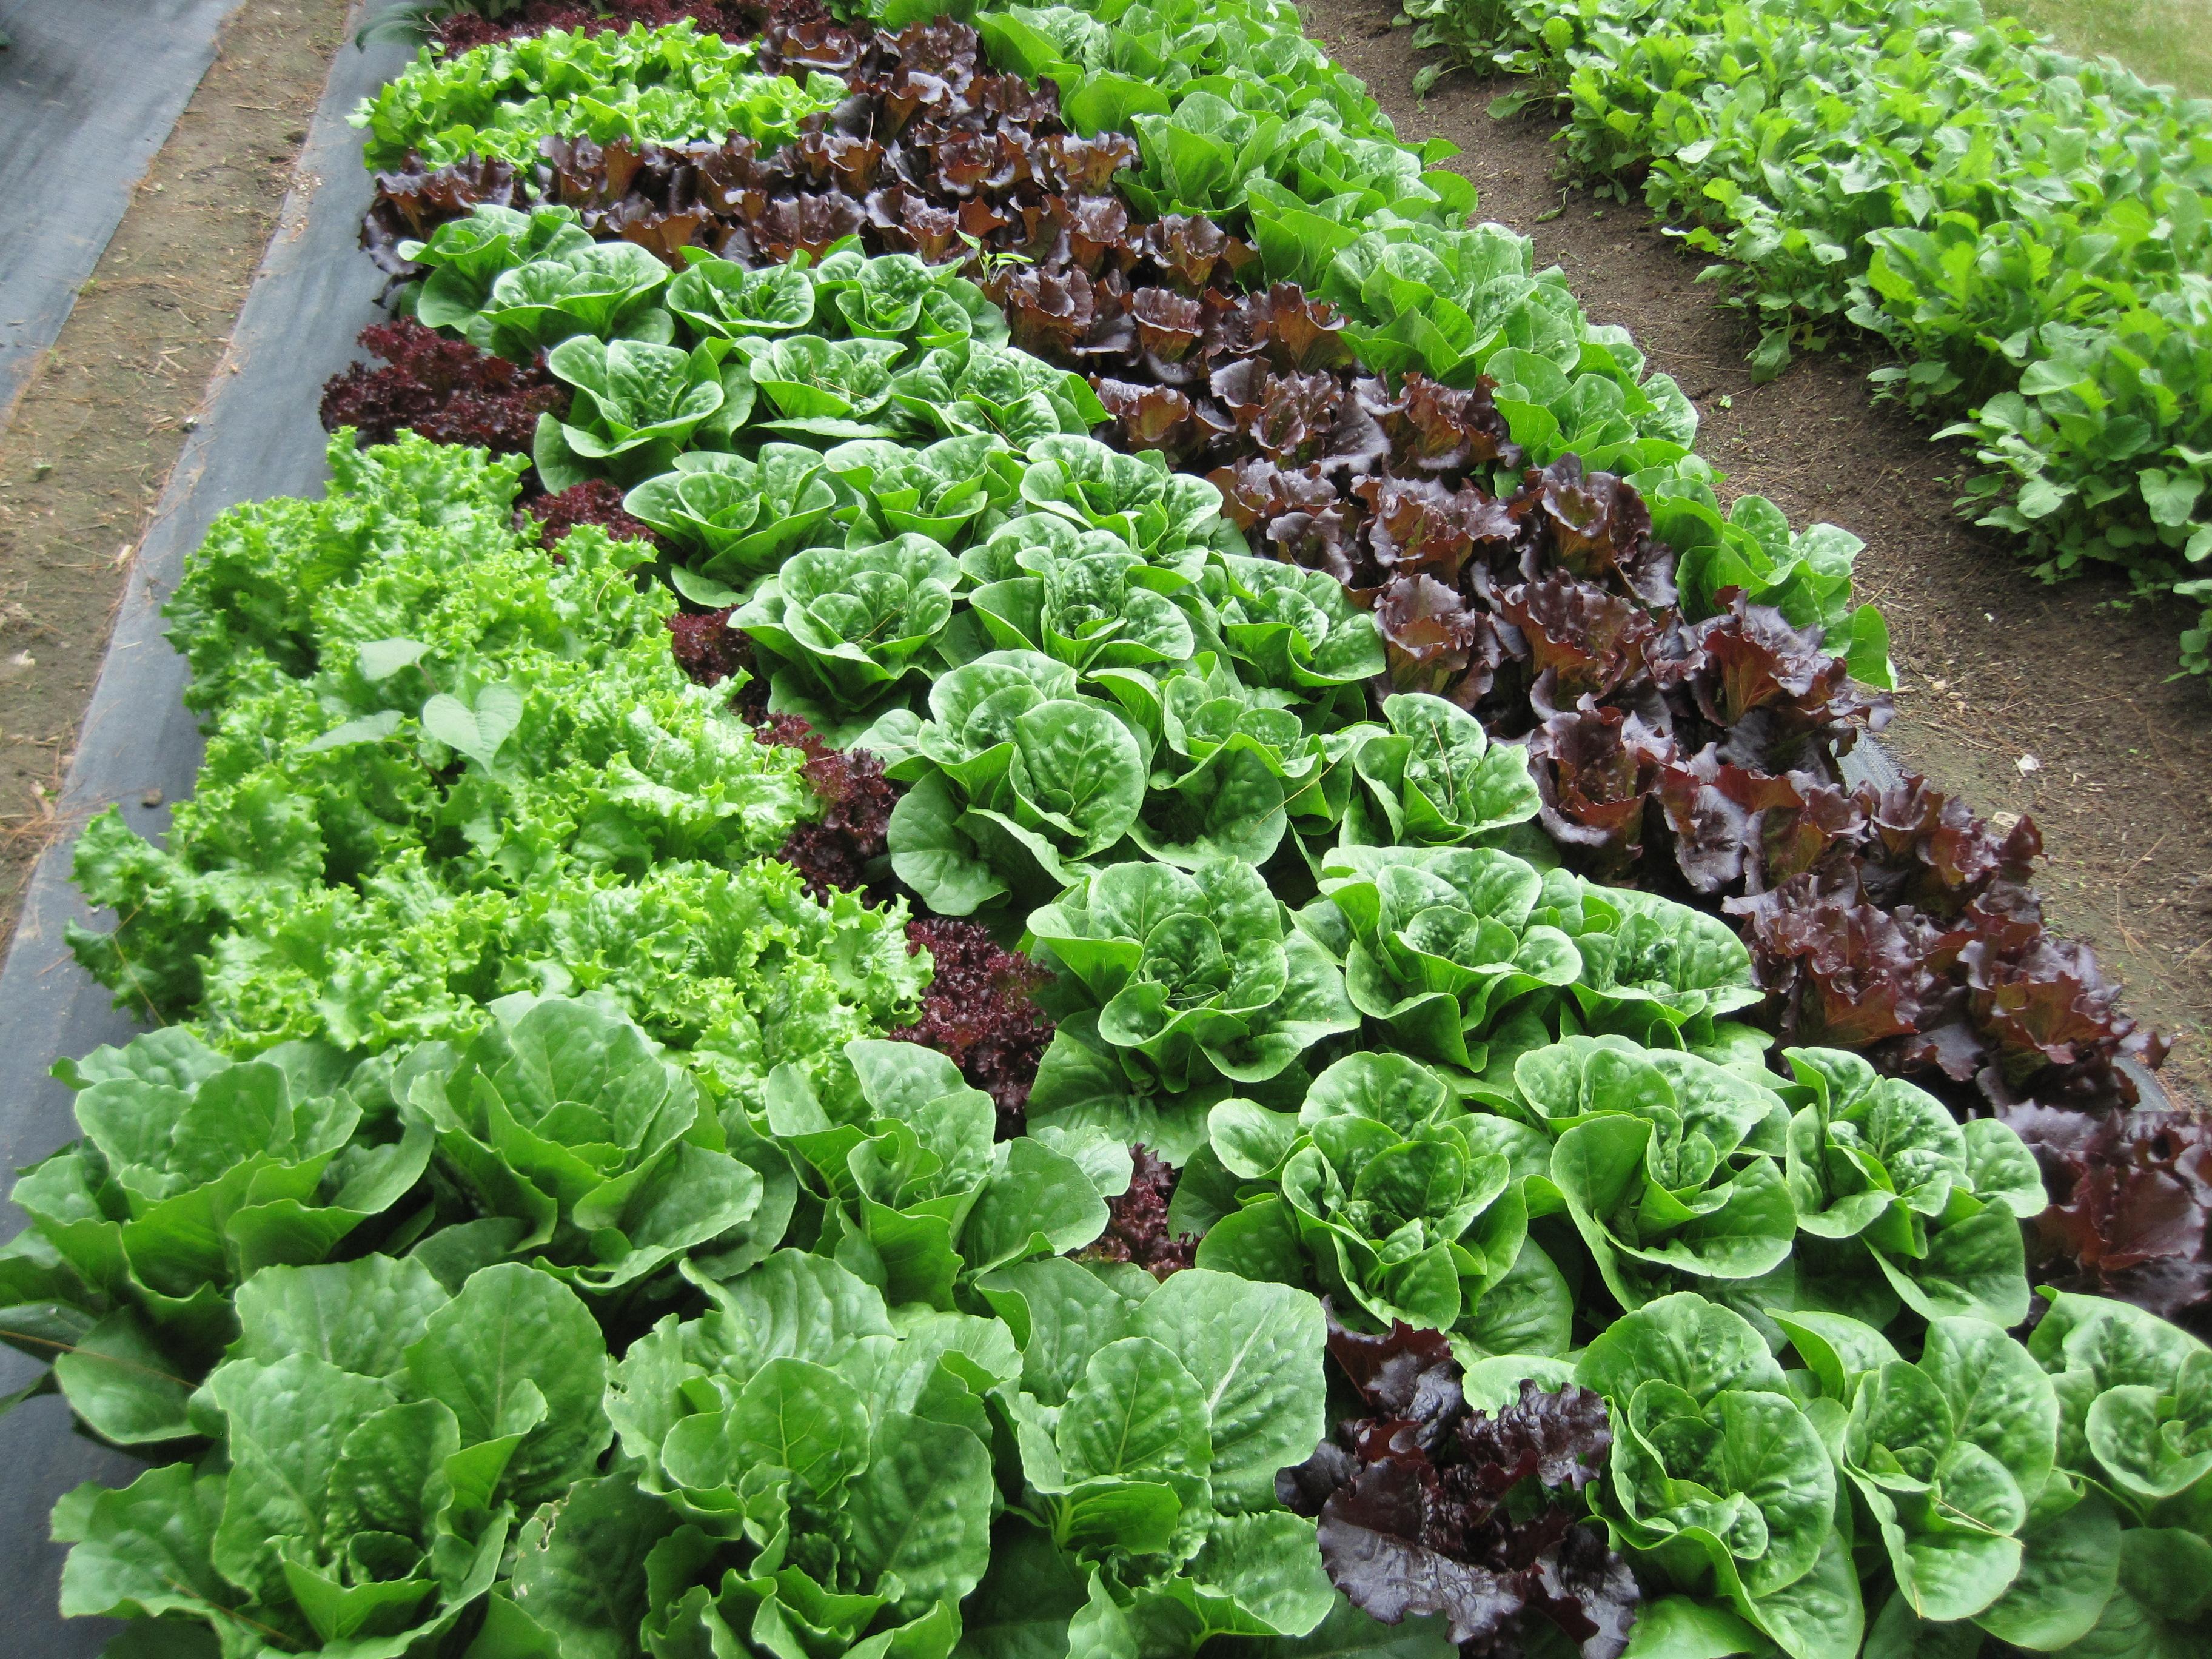 Image of lettuce